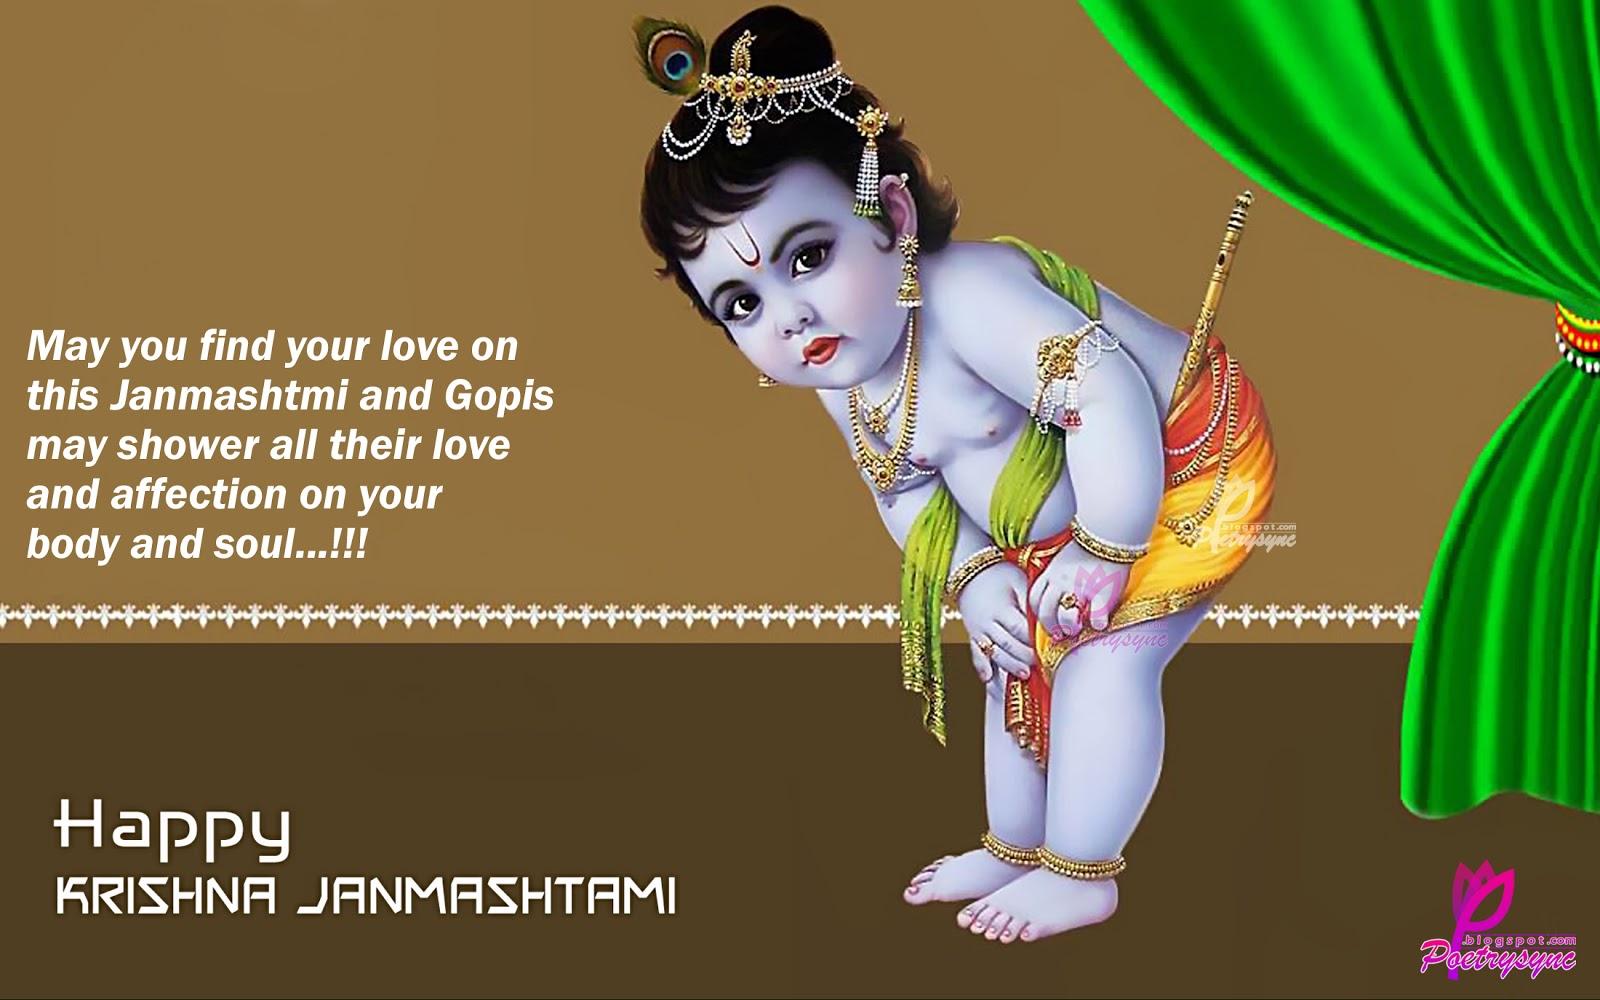 happy Krishna Janmashtami images in english